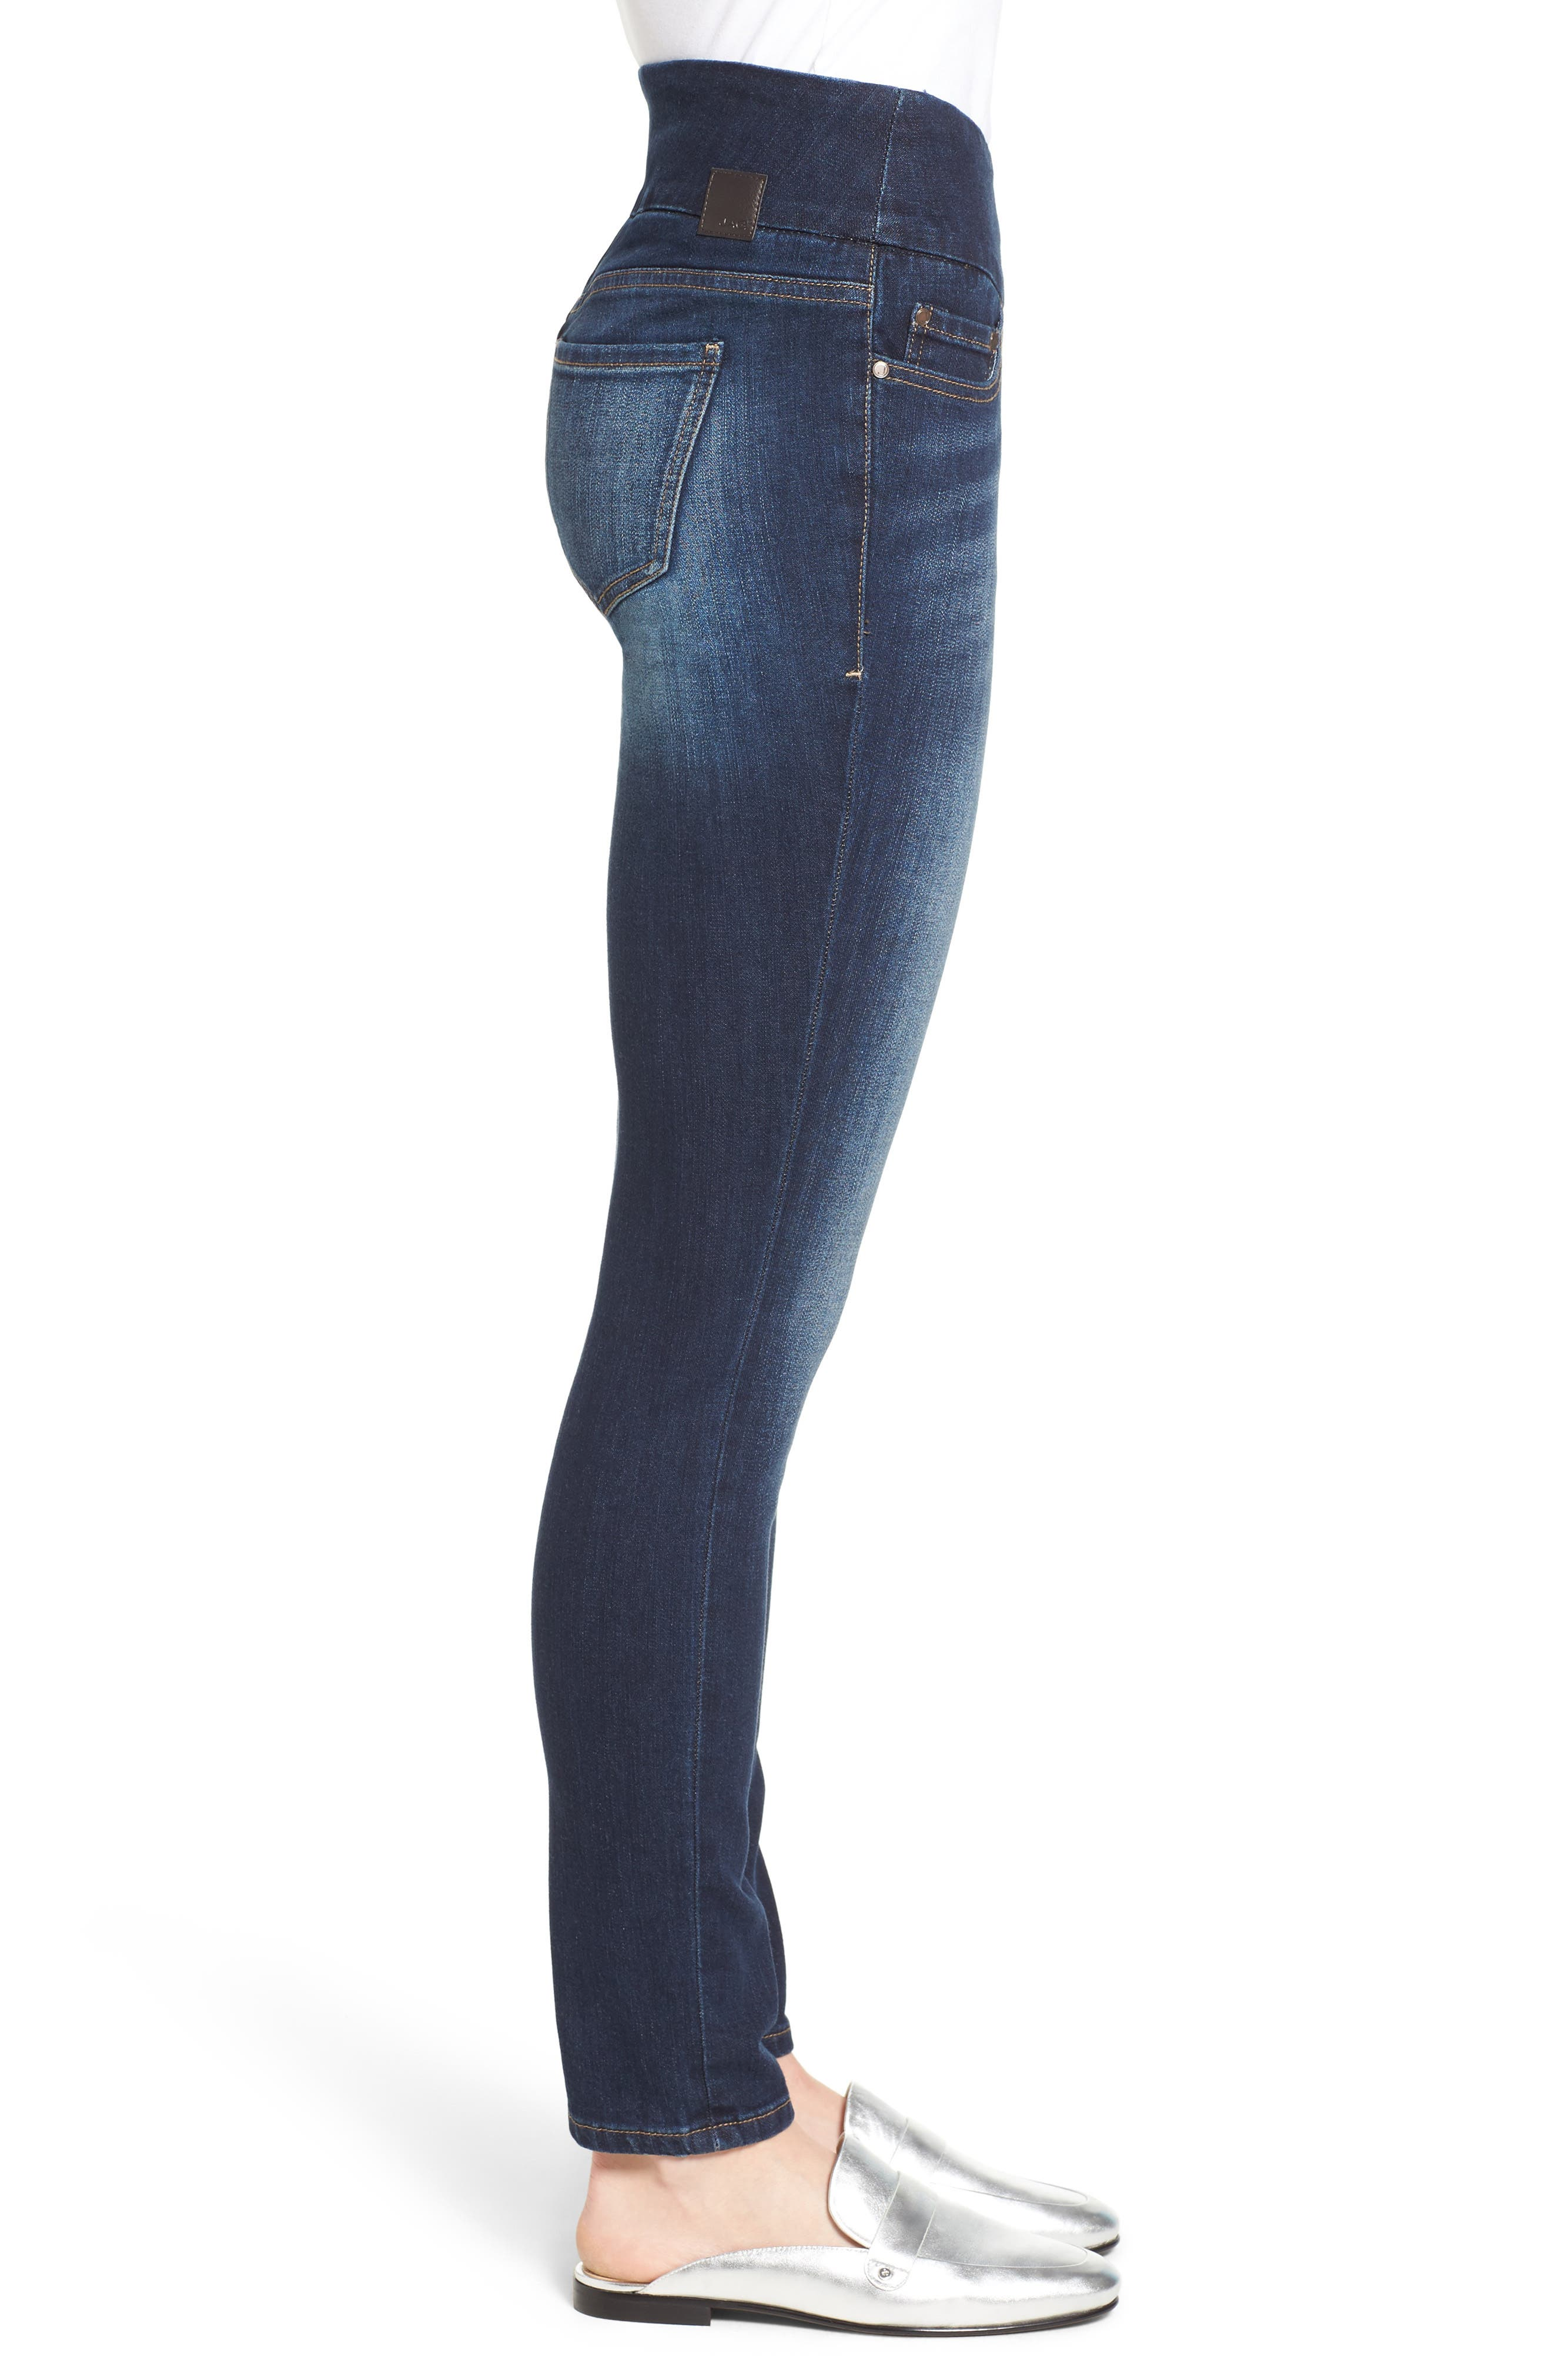 Alternate Image 3  - Jag Nora Stretch Cotton Skinny Jeans (Medium Indigo)